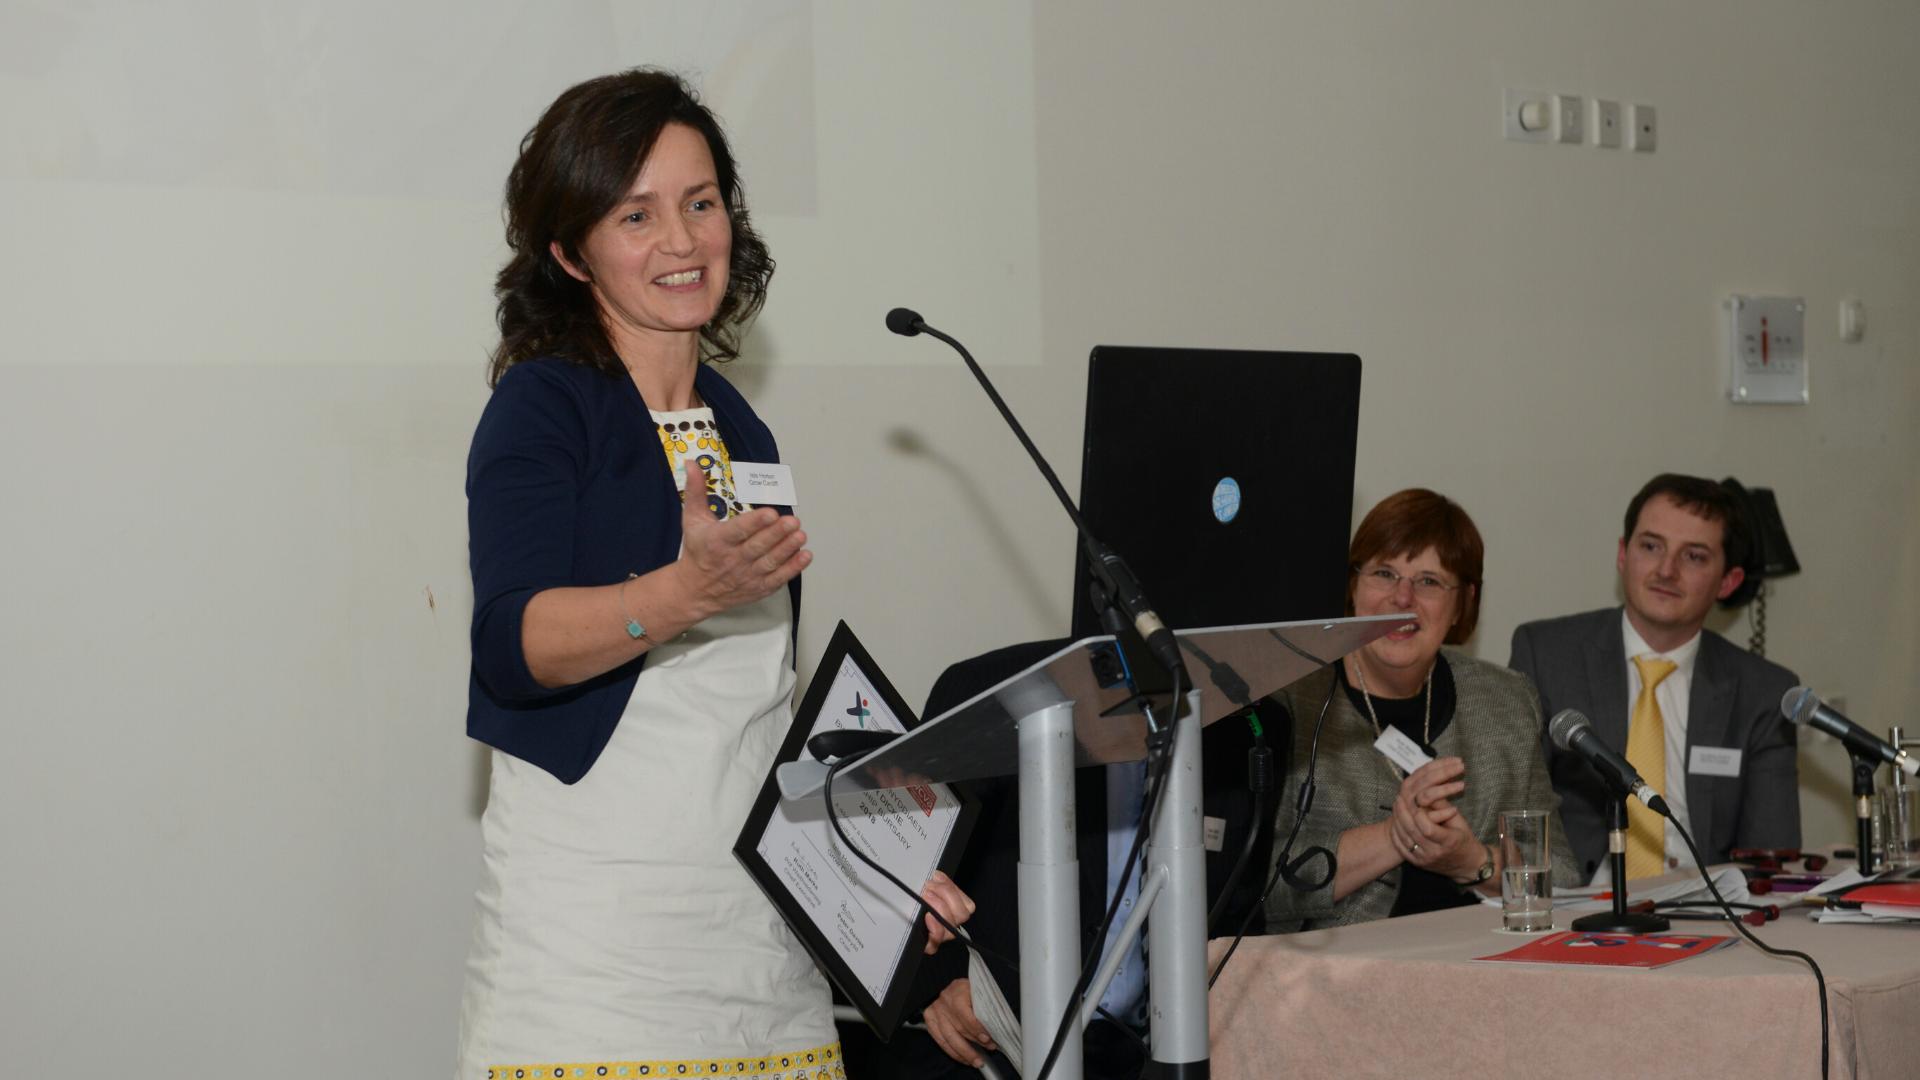 Isla Horton giving speech at WCVA AGM 2018